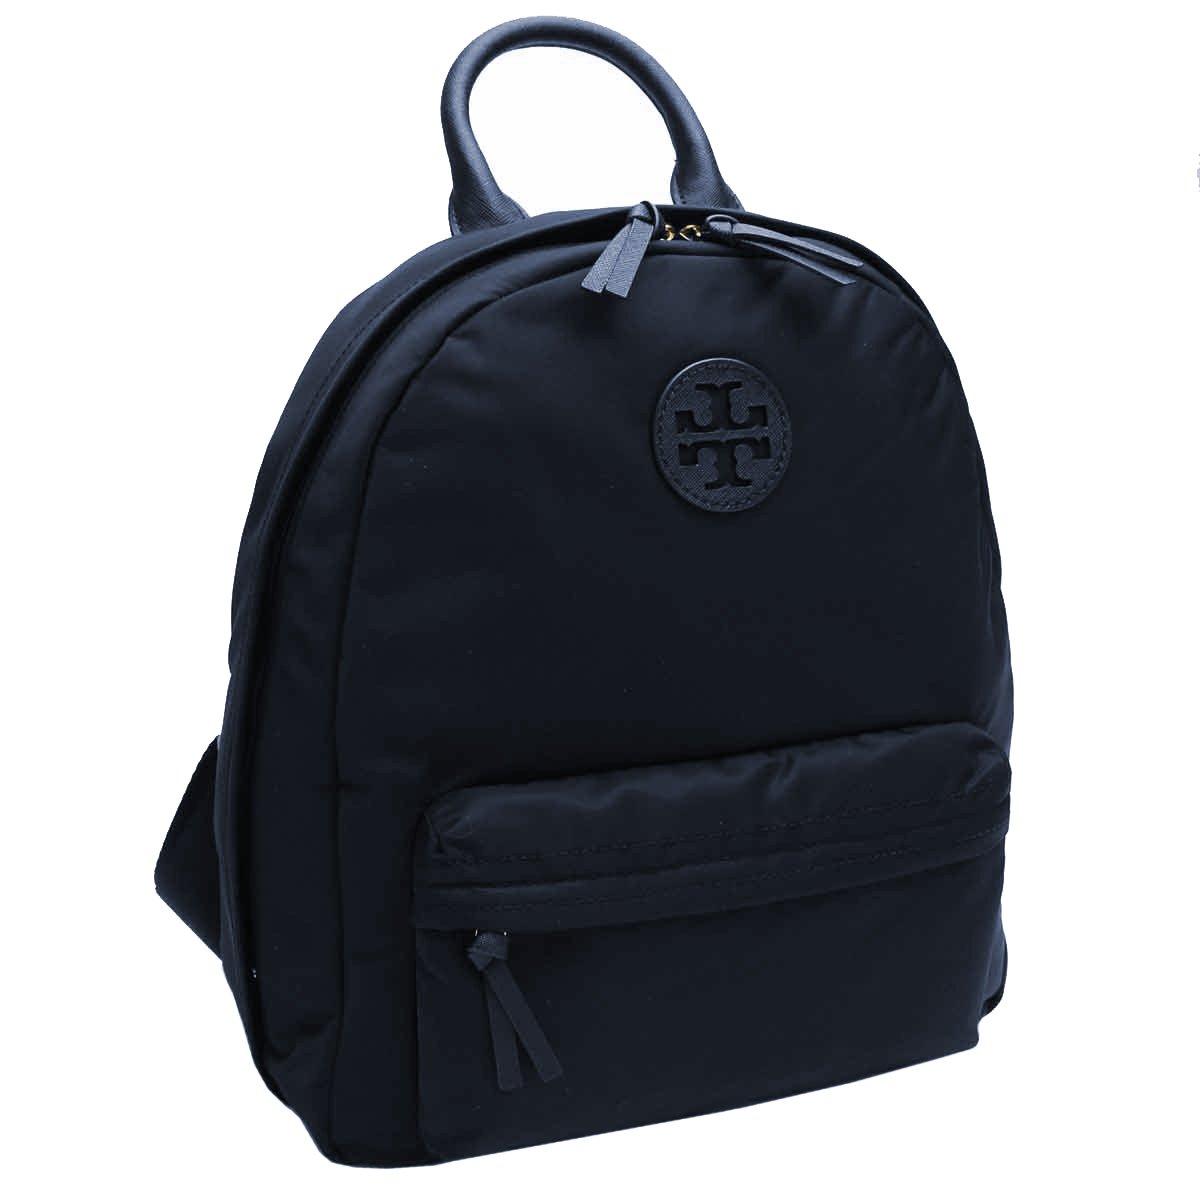 Tory Burch Ella Backpack Handbag Bag Tory Navy